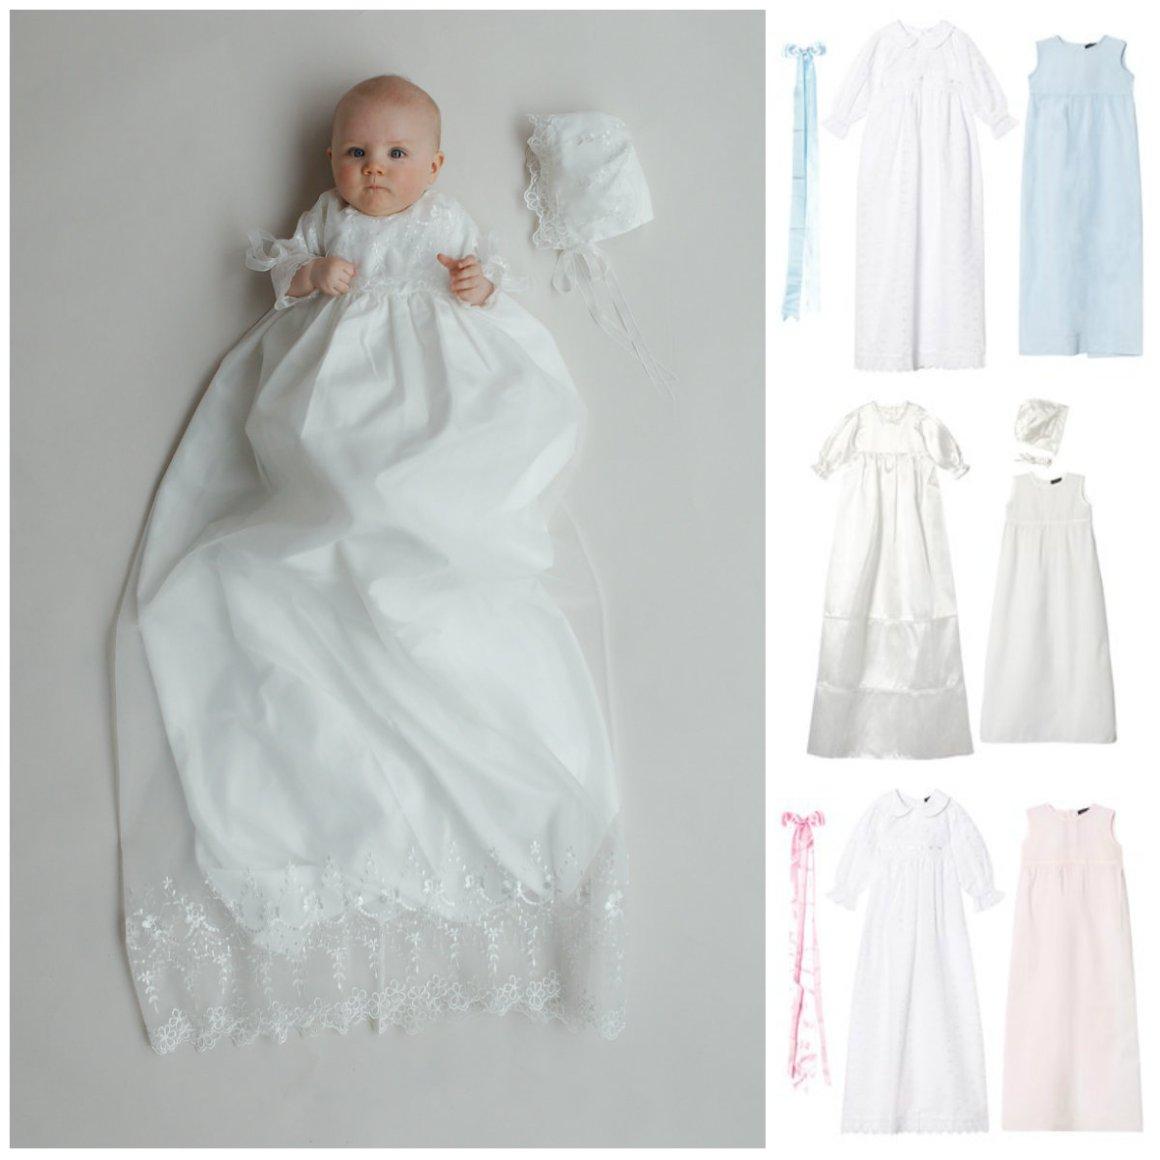 dåbskjole barnedåbskjole hvid dåbskjole køb dåbskjole pris find din dåbskjole her